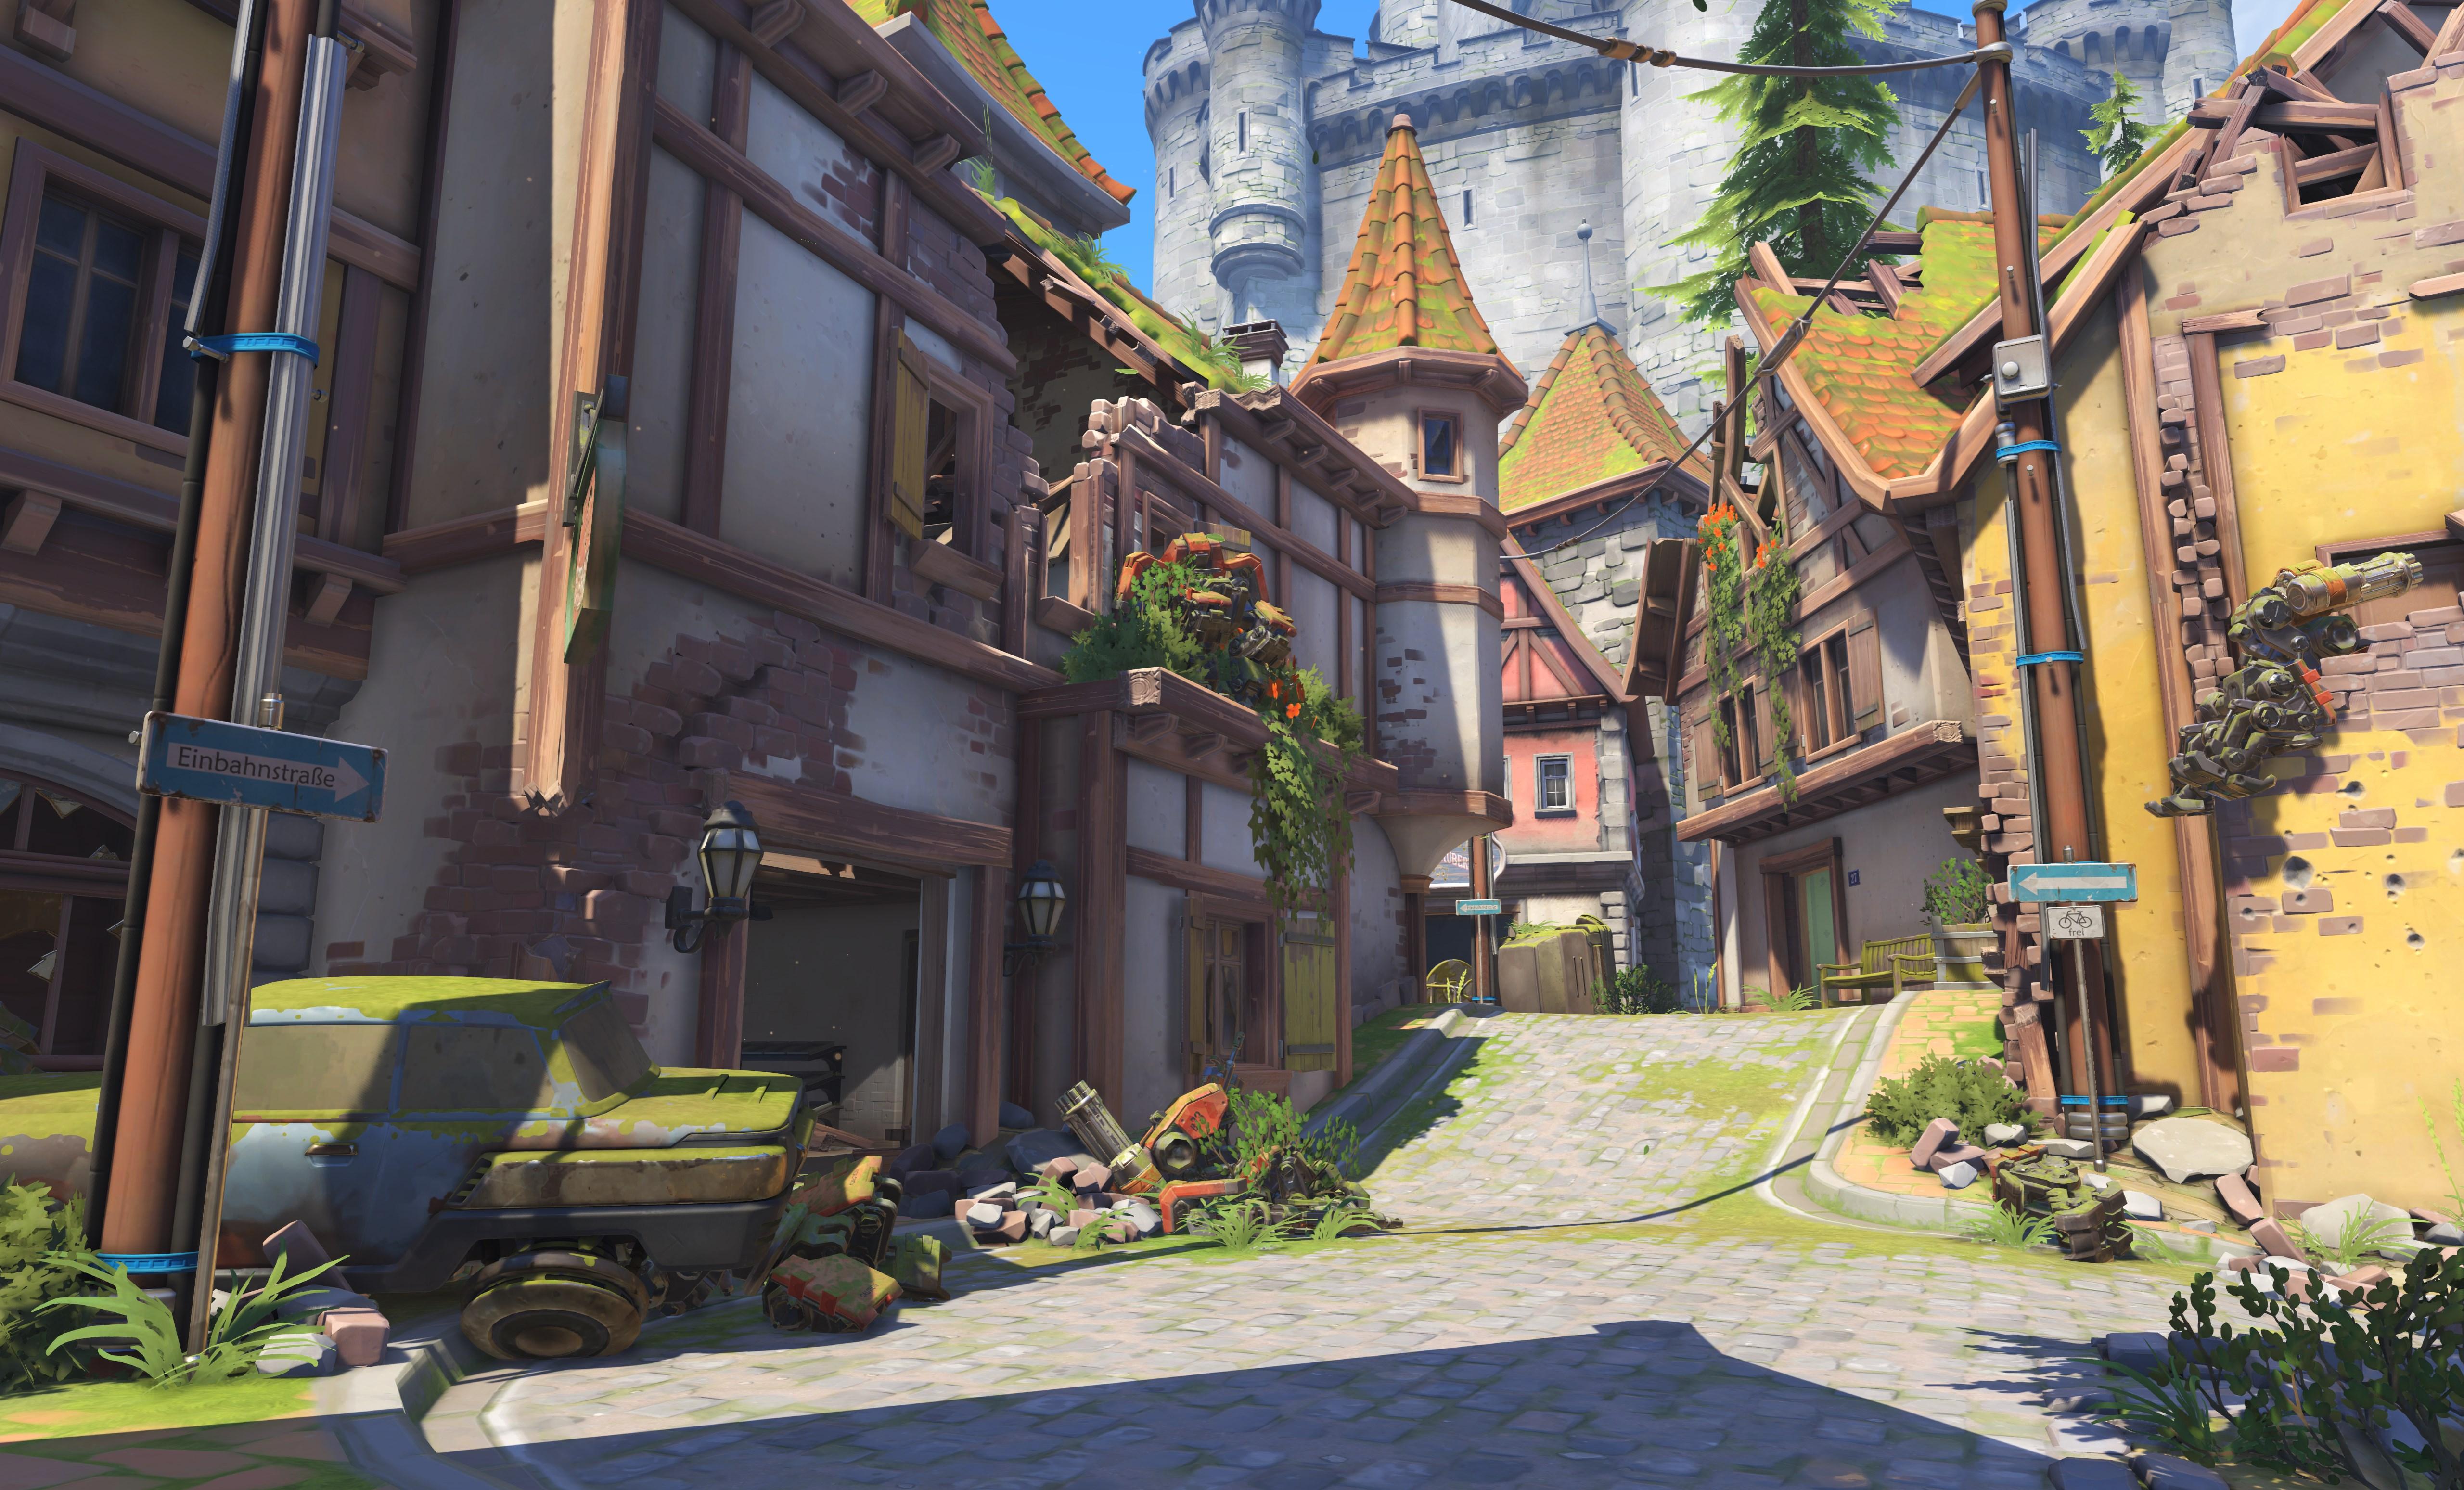 Eichenwalde là bản đồ thứ 13 của Overwatch - Ảnh 10